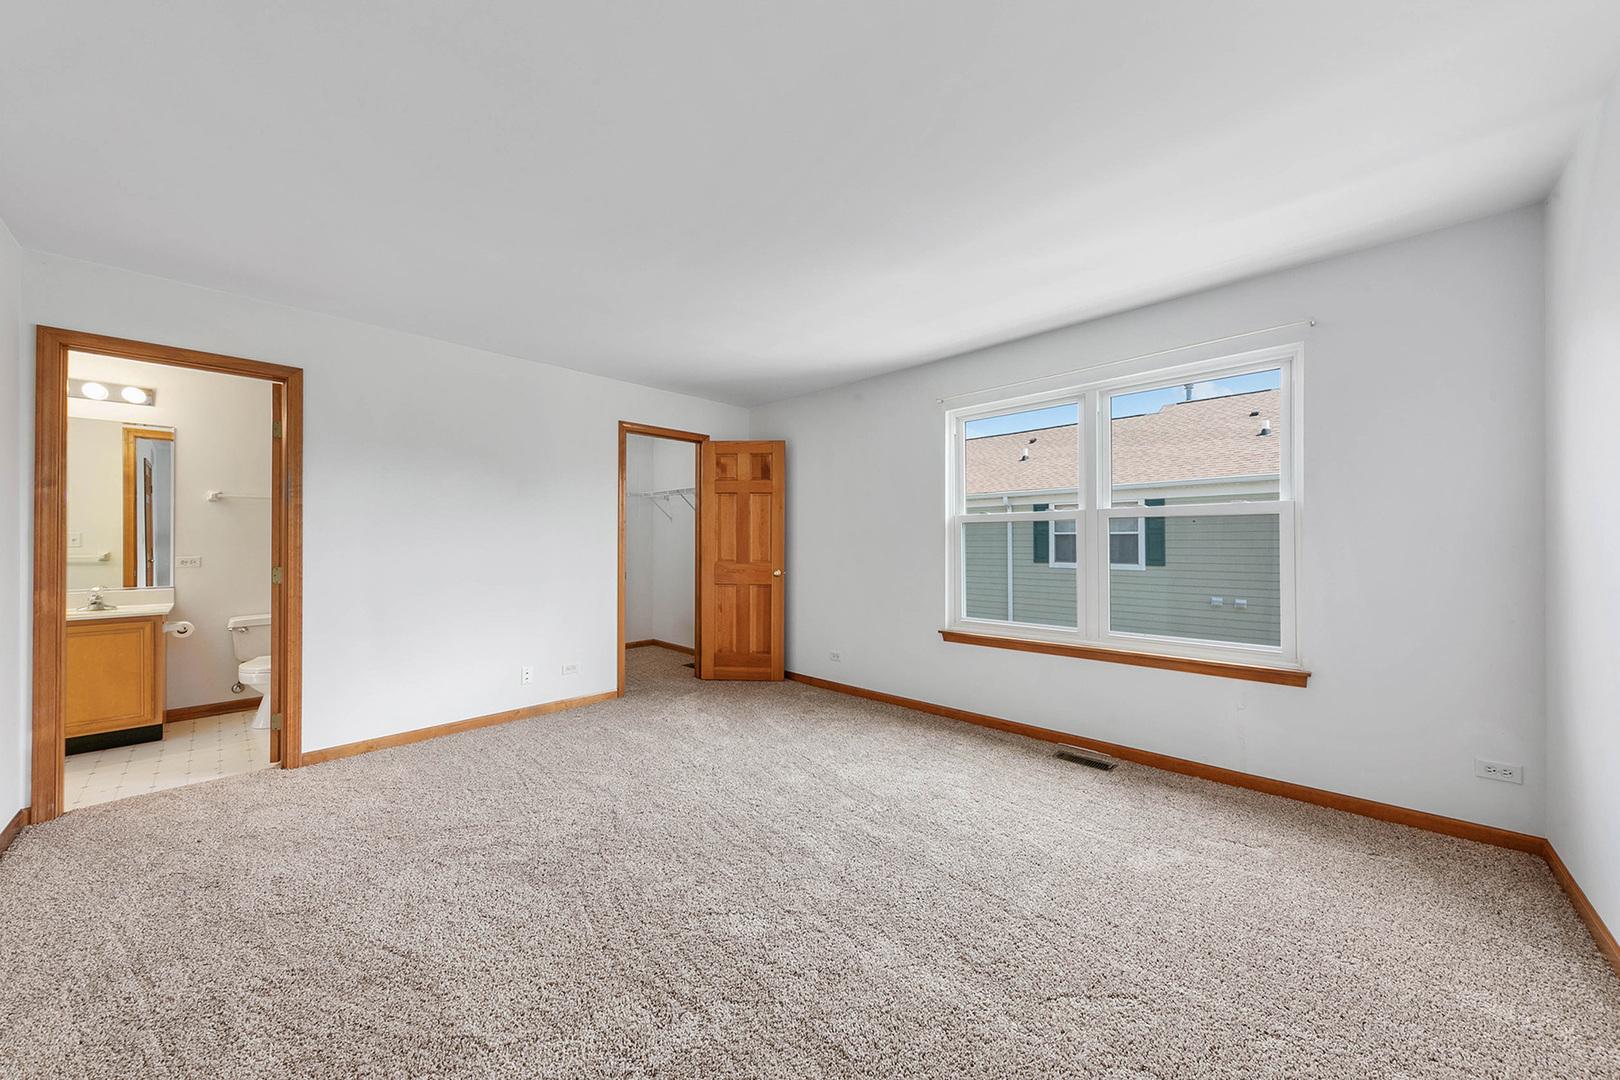 2445 Courtyard 2, AURORA, Illinois, 60506